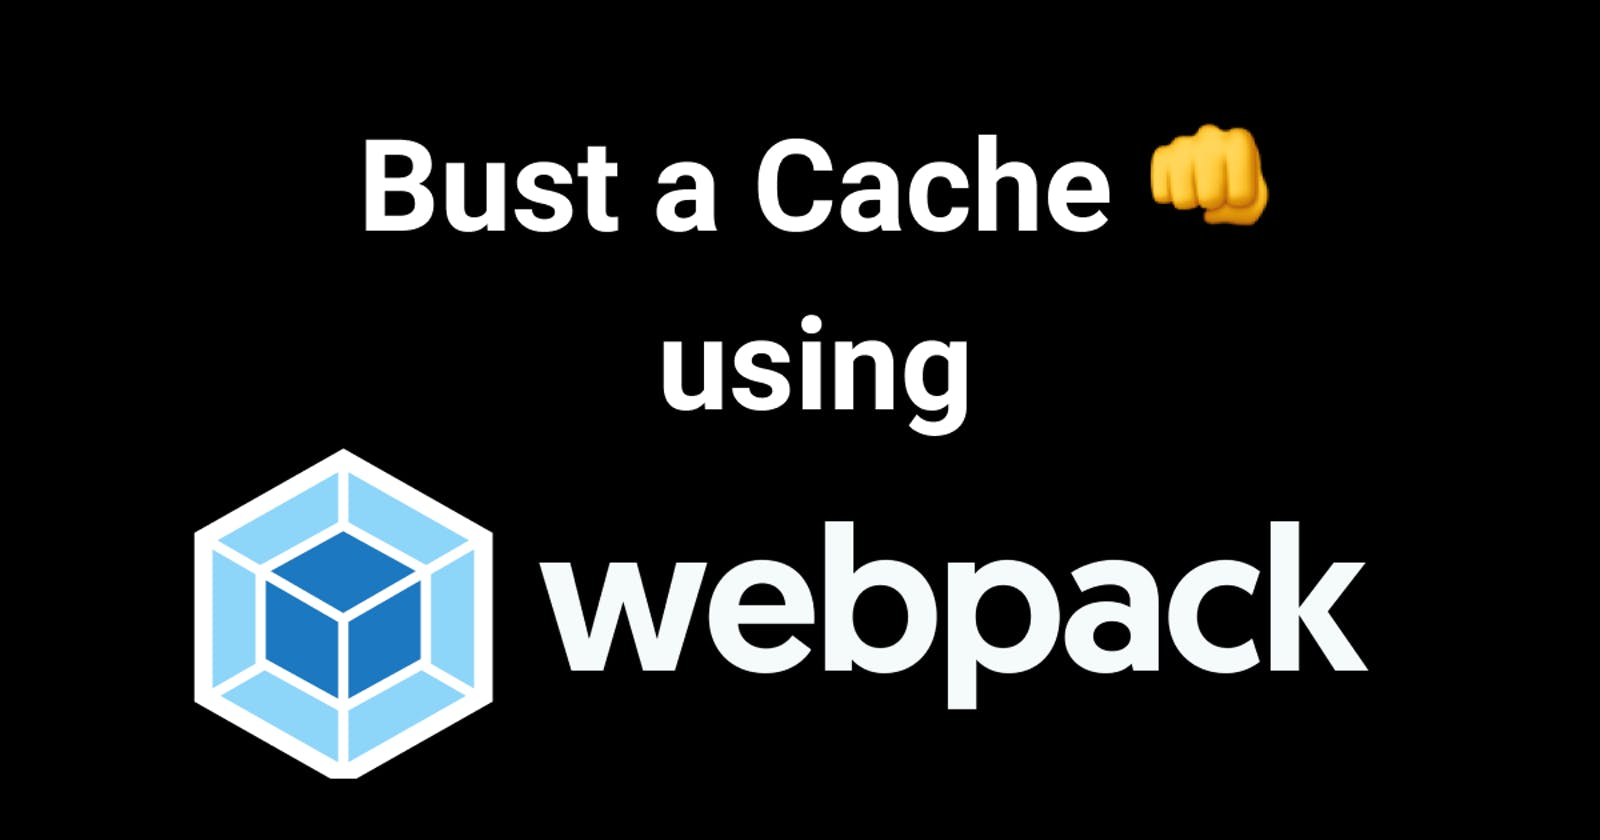 Bust a Cache using webpack